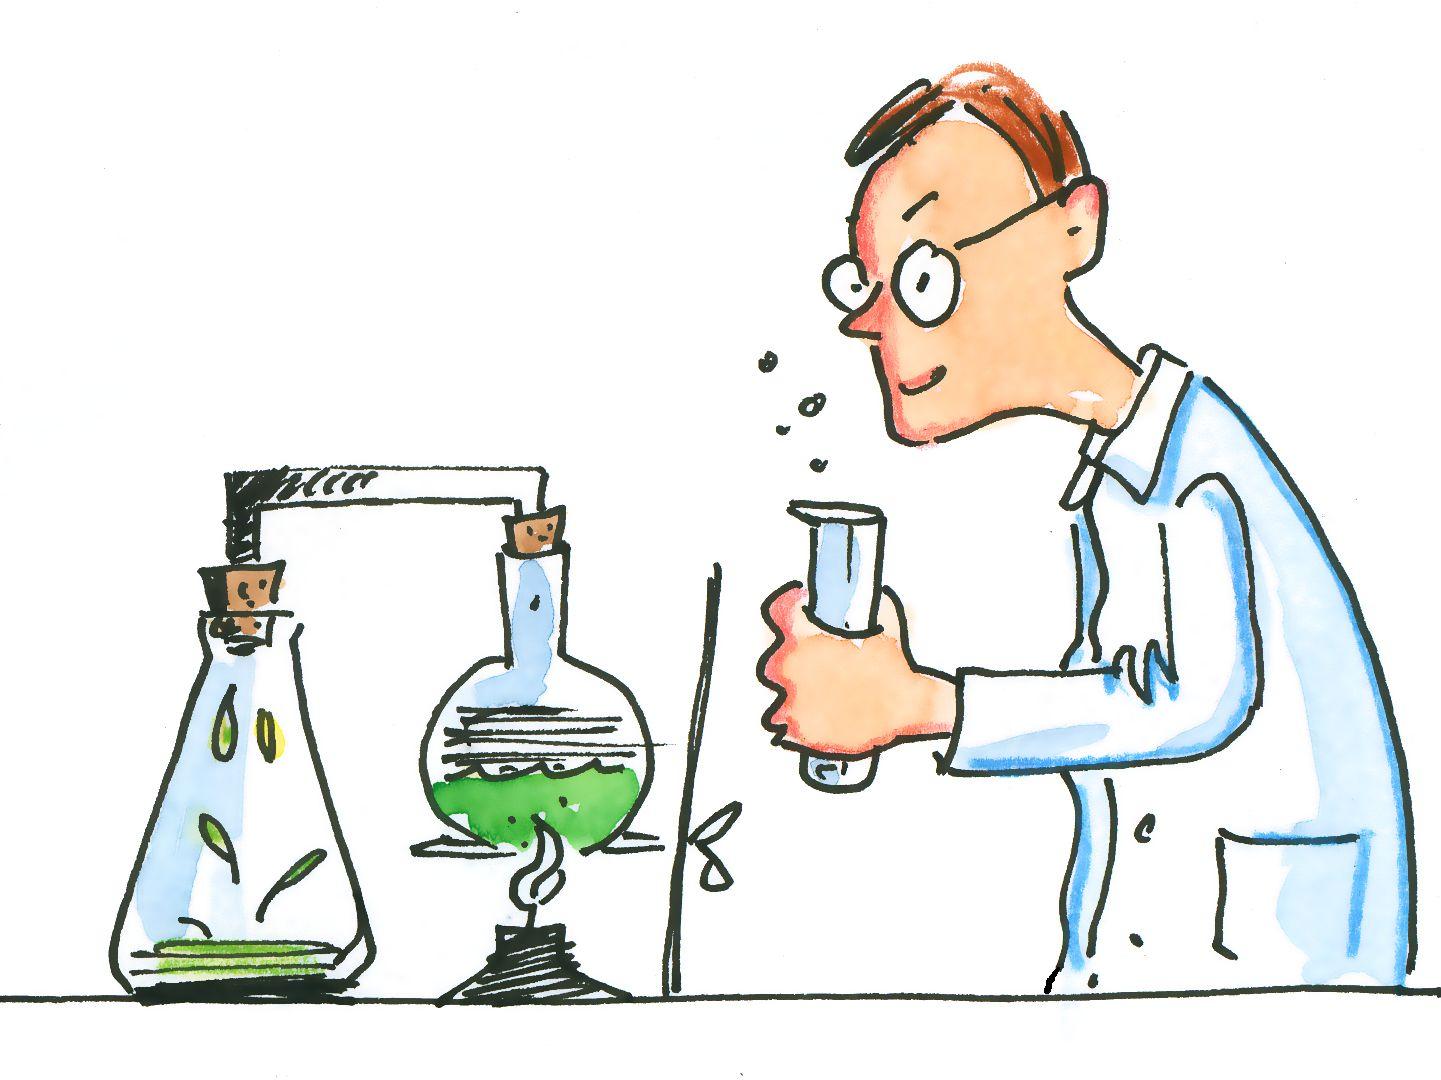 Chemie clipart jpg transparent download Chemie clipart 9 » Clipart Station jpg transparent download